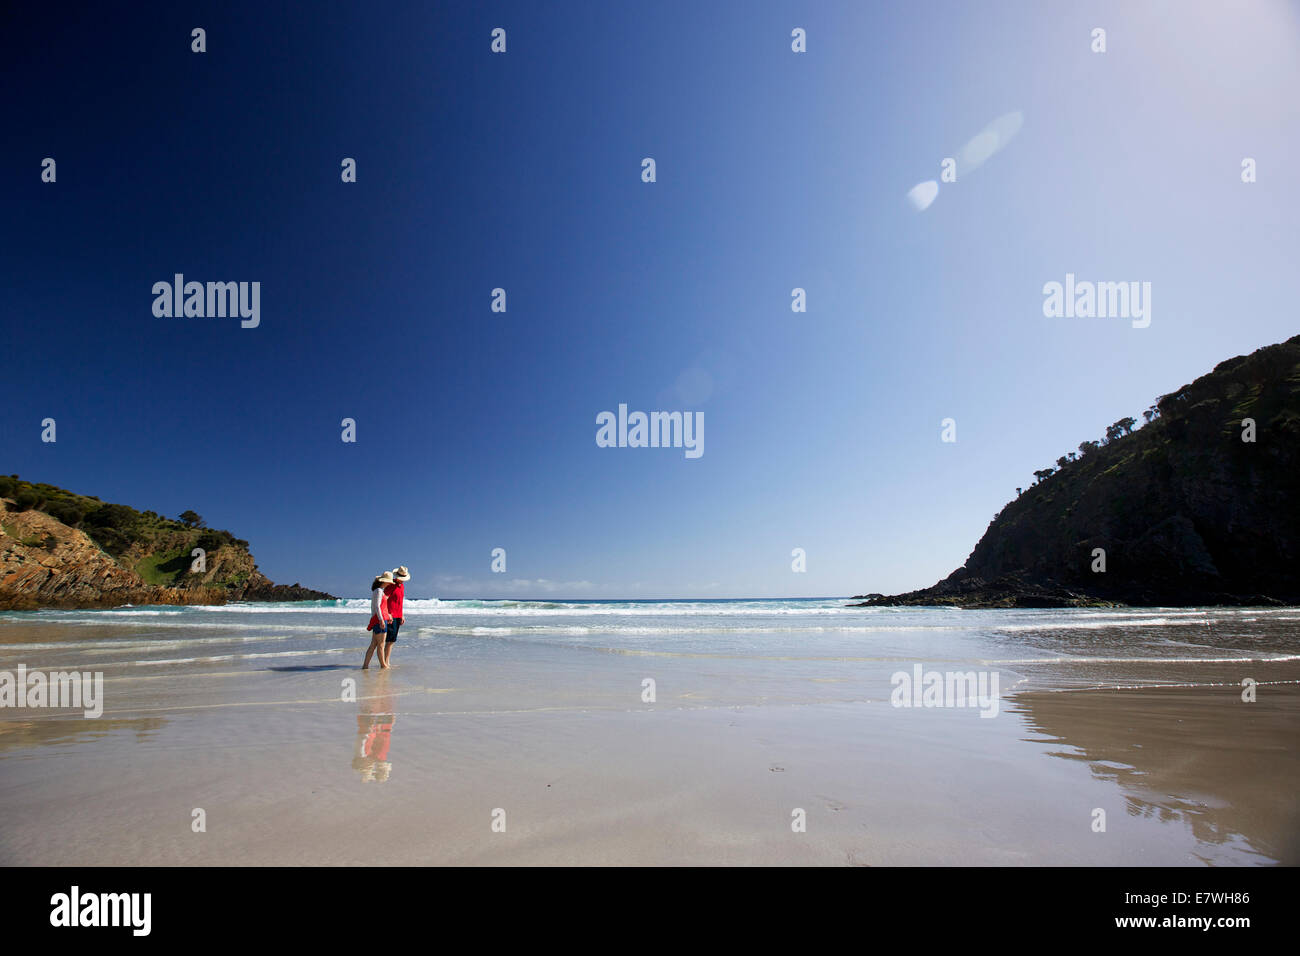 A couple walking along a private beach, on holiday, Snug Cove, Kangaroo Island, South Australia - Stock Image